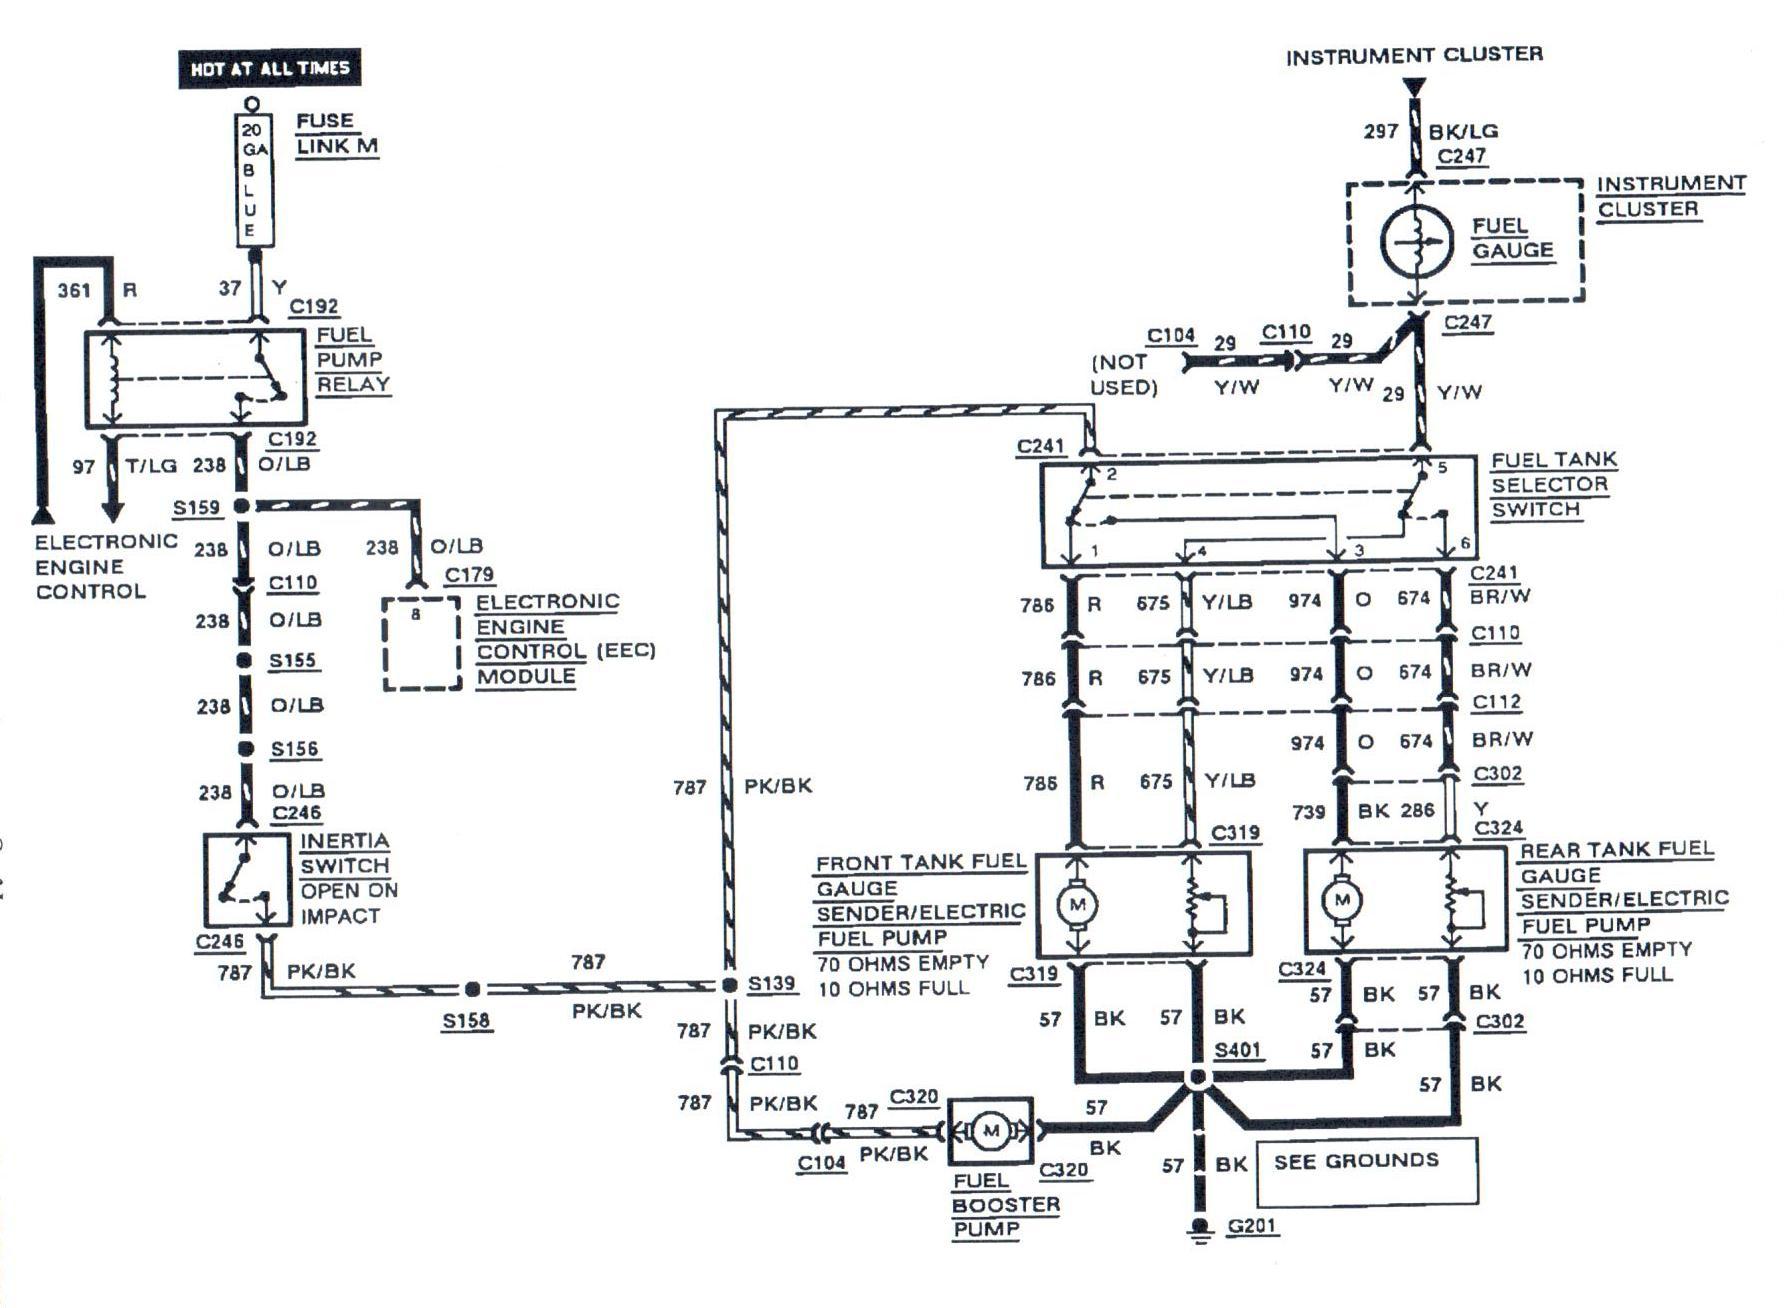 1984 ford e350 wiring diagram 1990 club car battery 36 volt 1985 f 250 truck